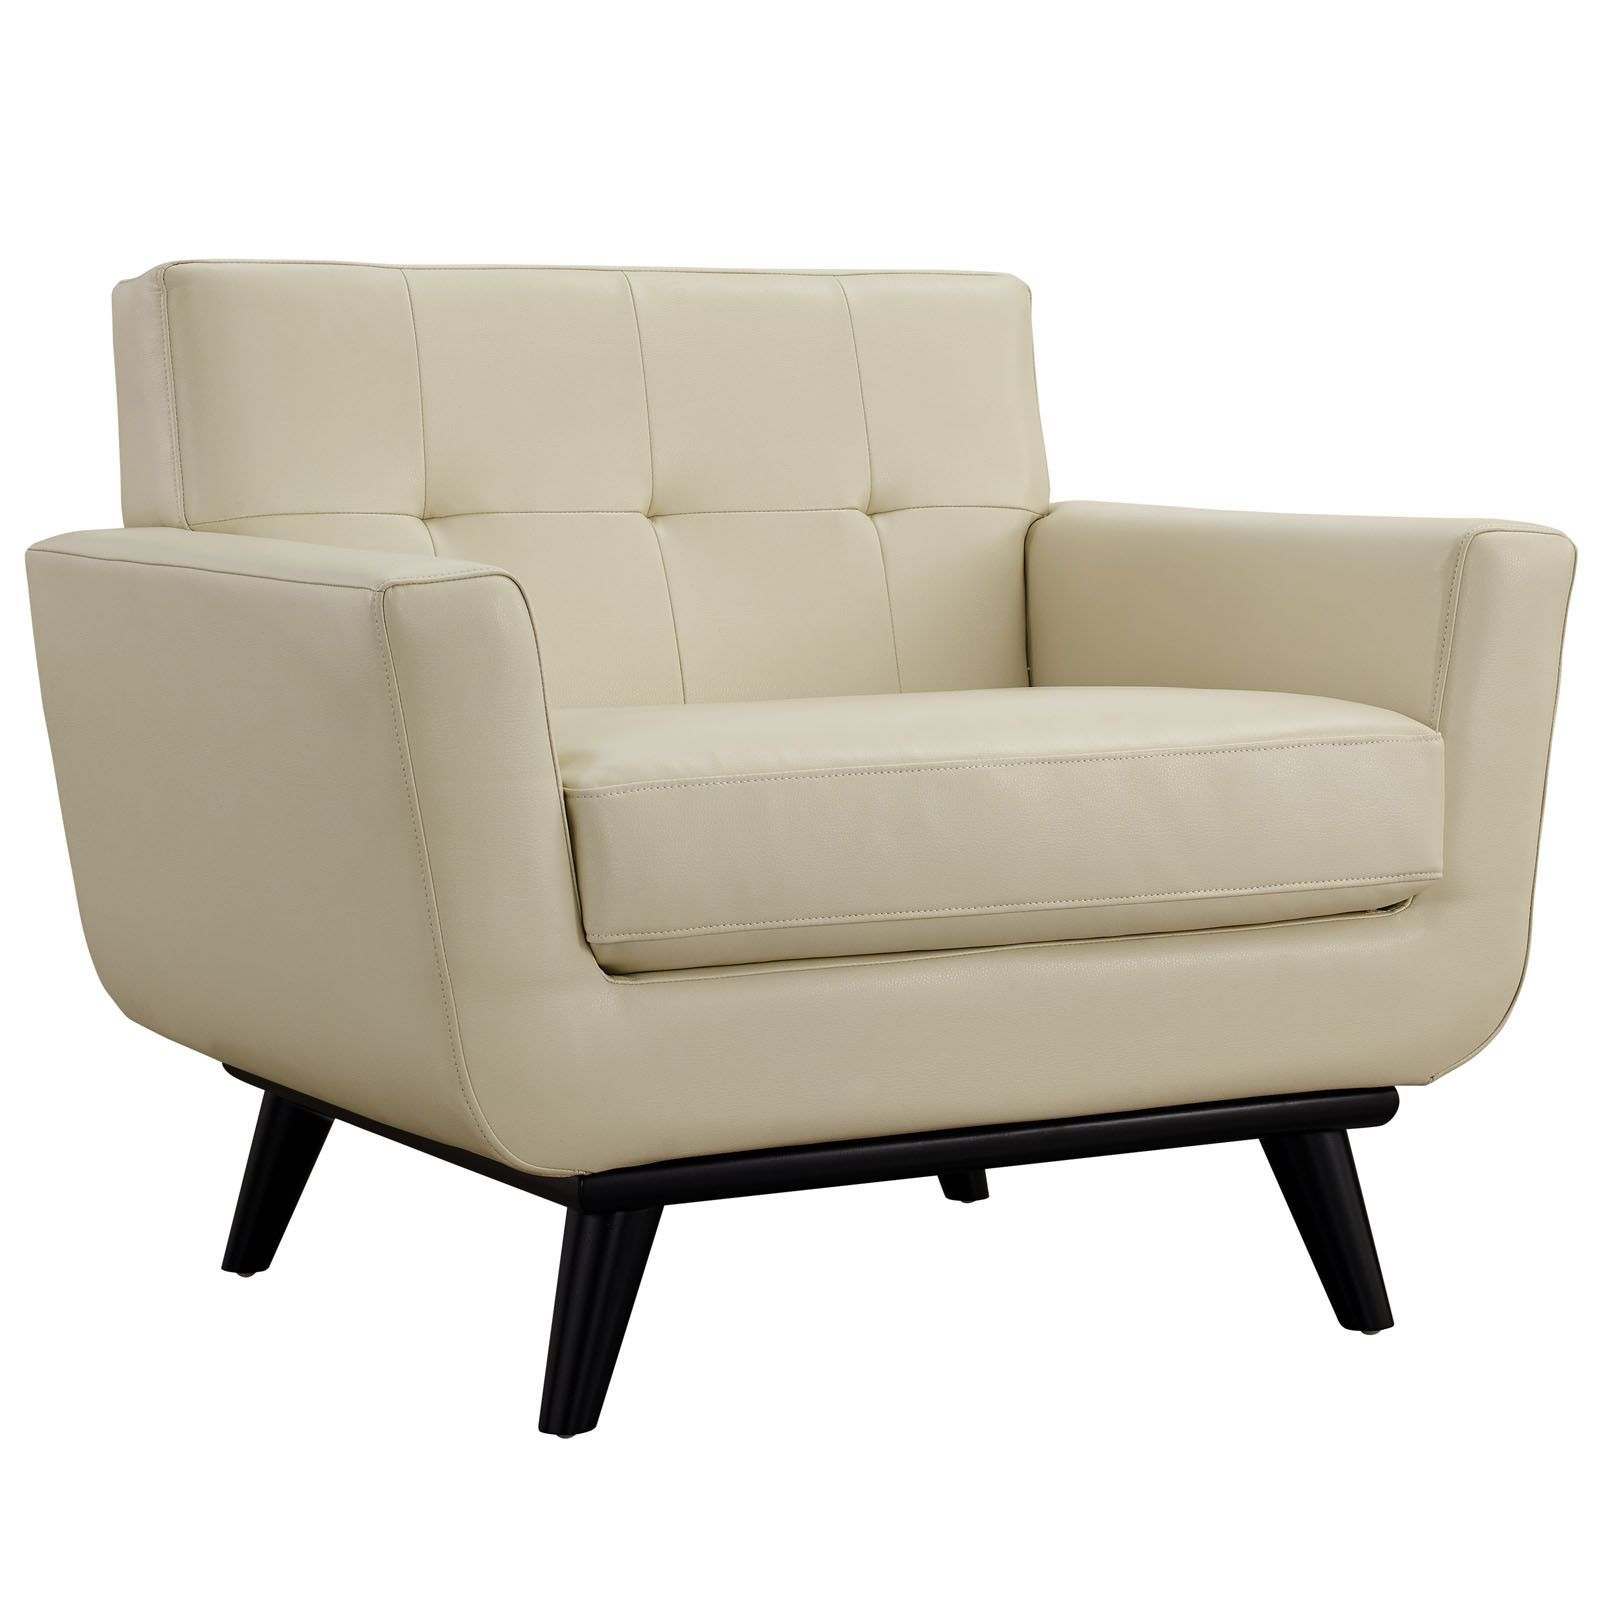 Beige modern armchair - Emory Leather Armchair Beige